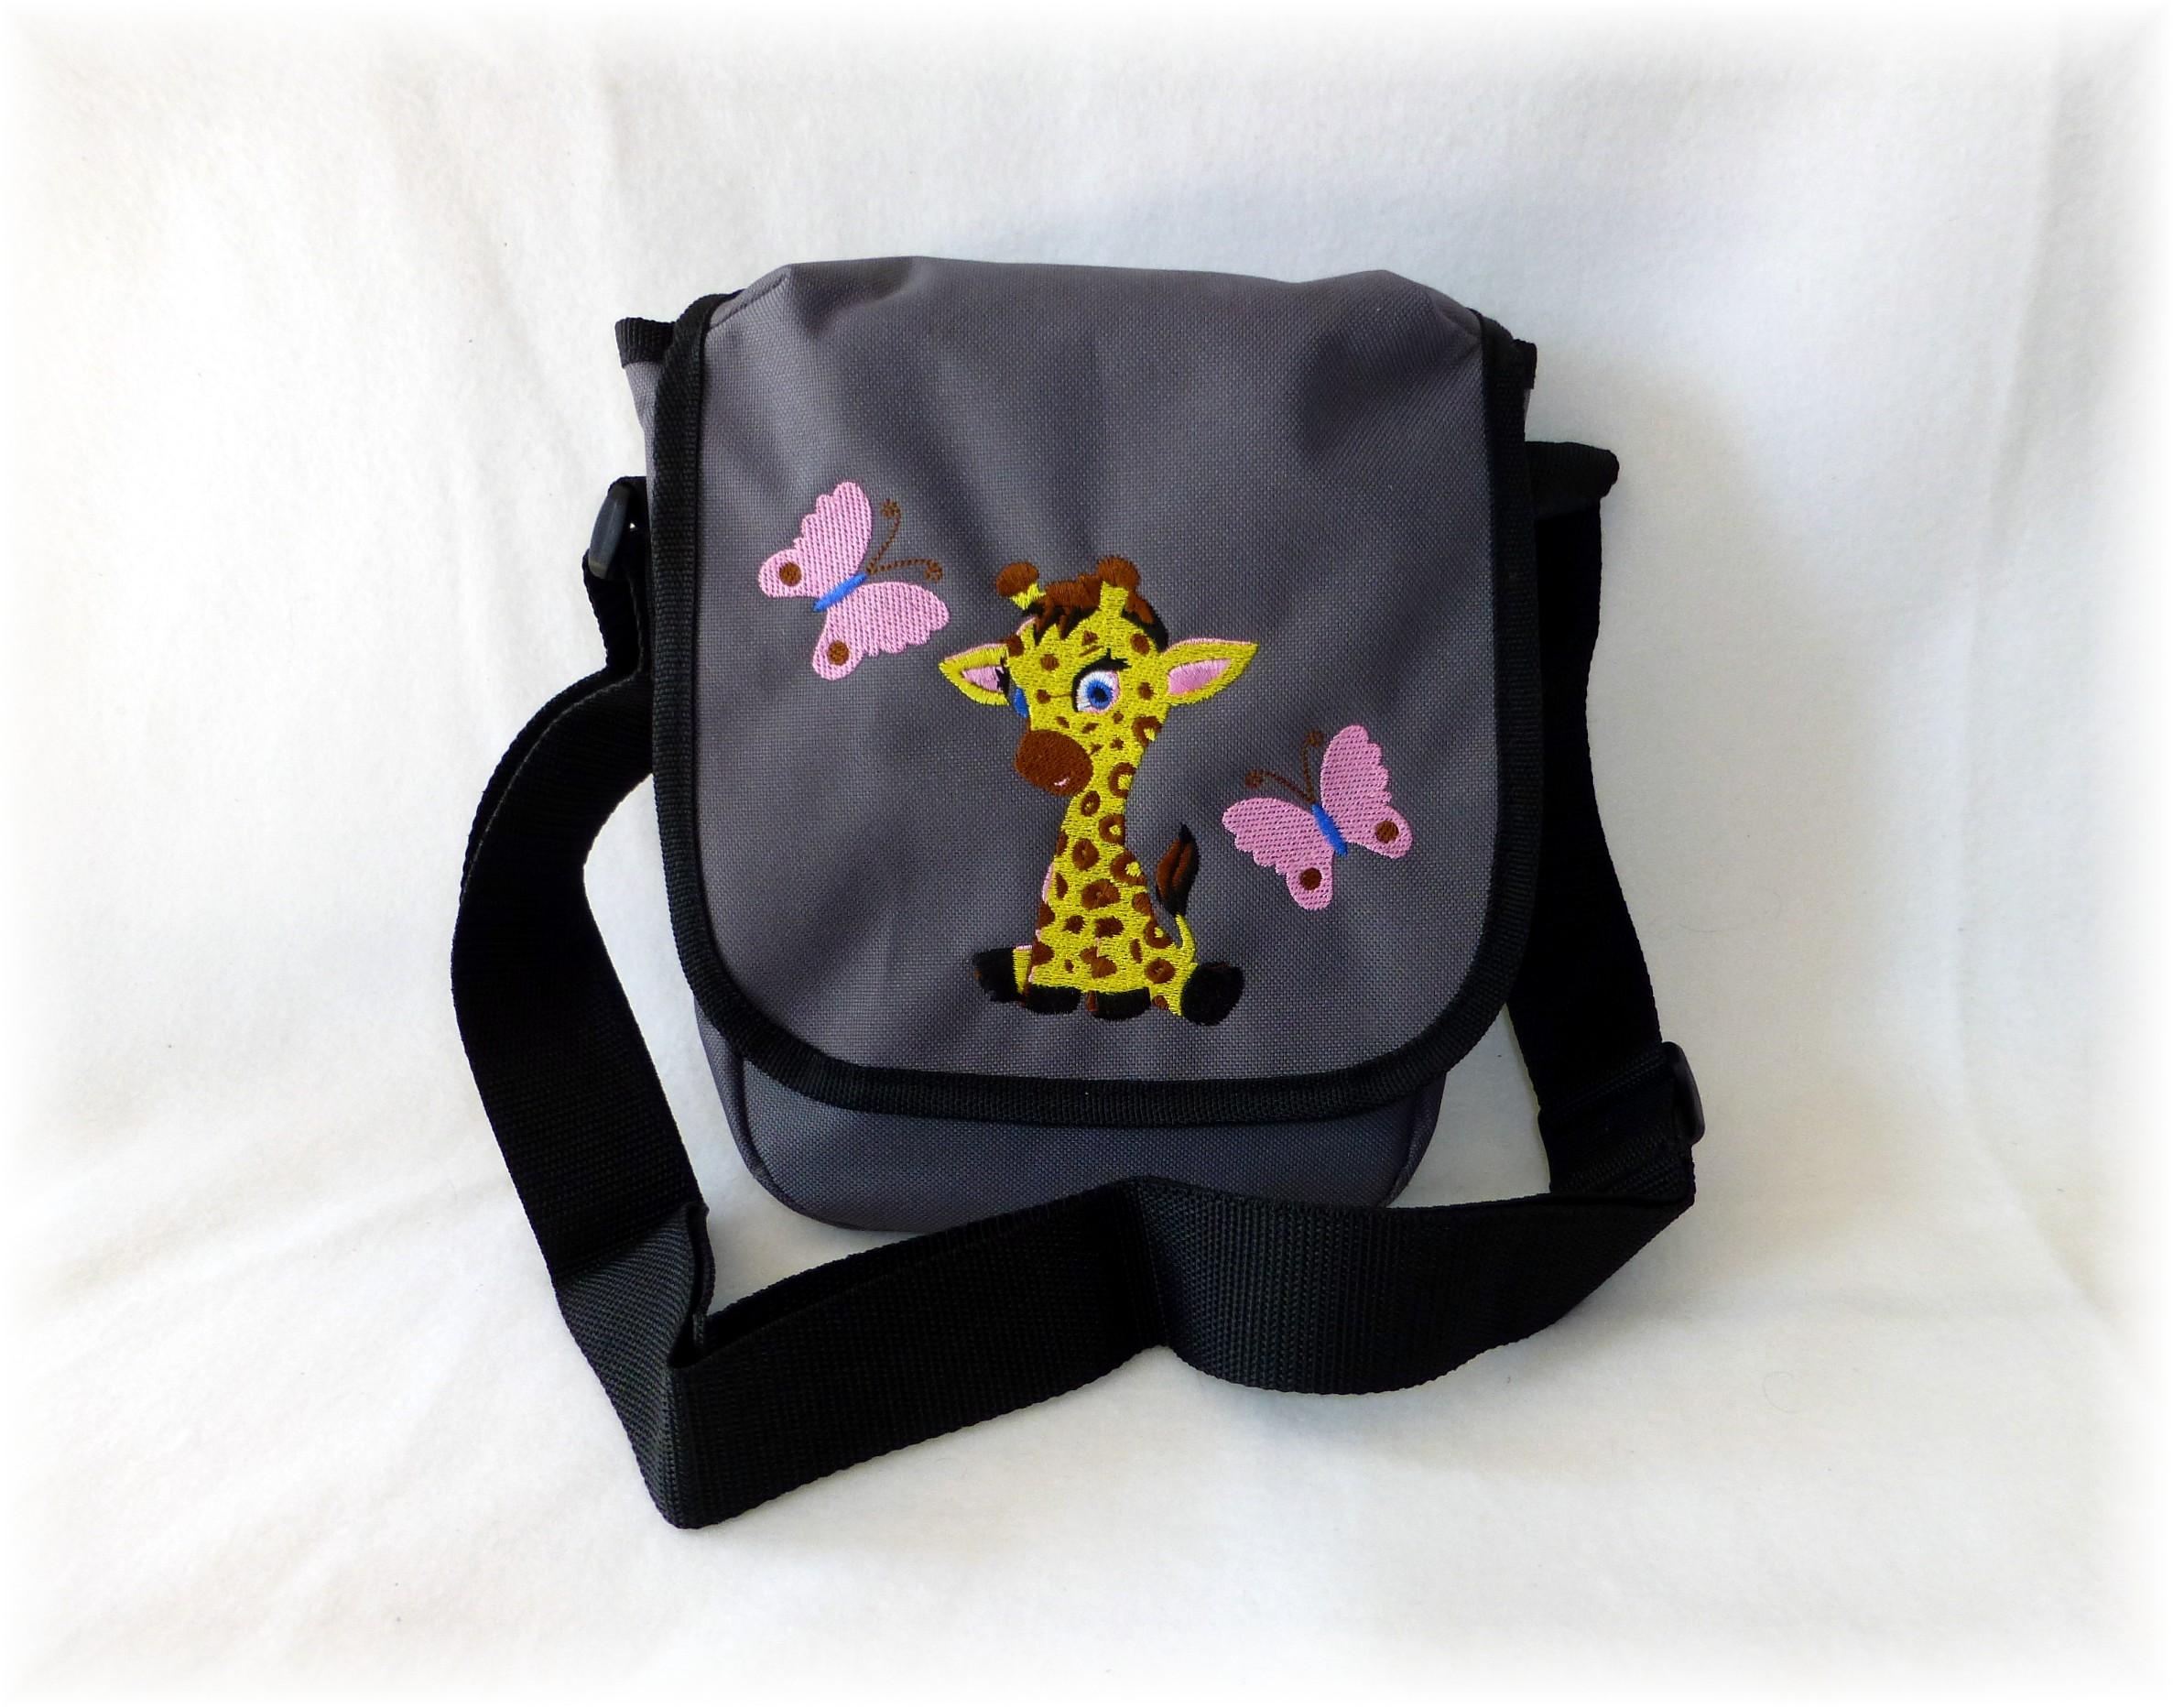 fuxis krabbelschuhe fuxis kindergartentasche giraffe bestickt. Black Bedroom Furniture Sets. Home Design Ideas